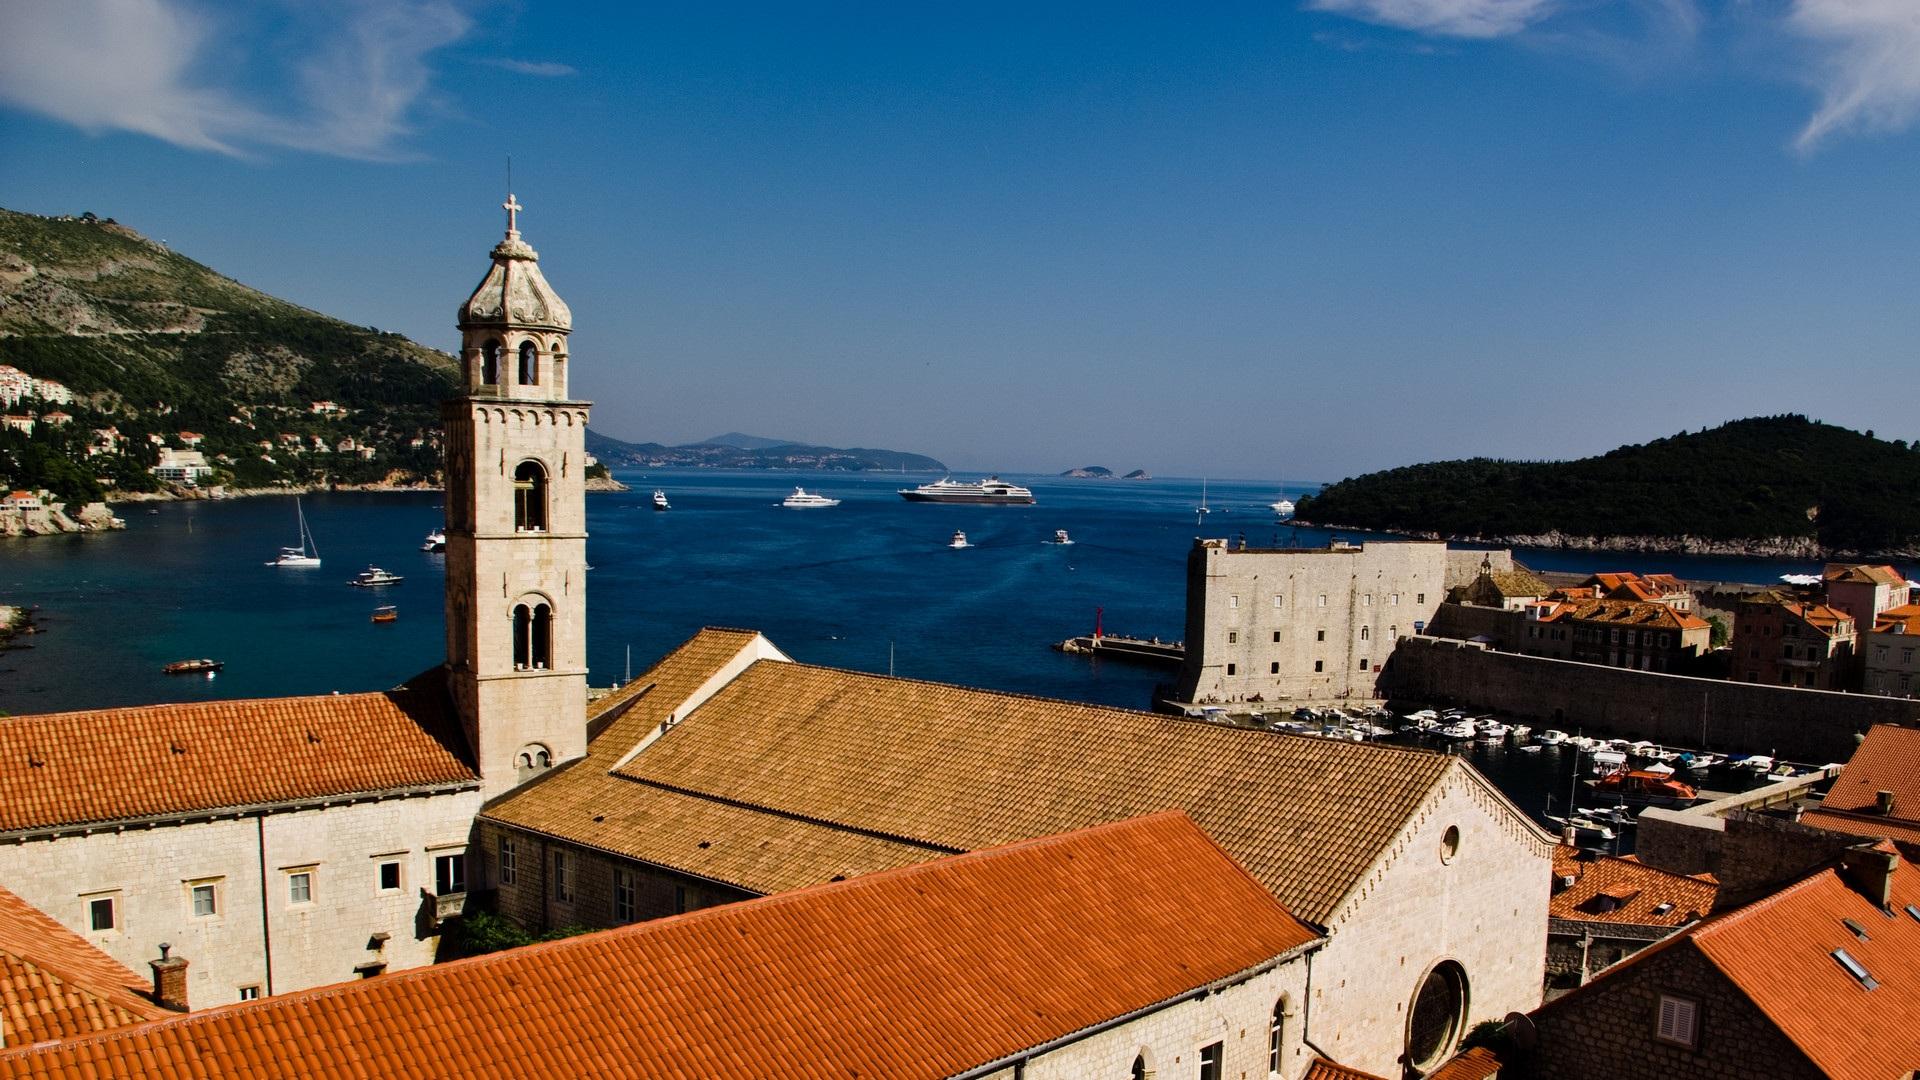 Обои хорватия, adriatic sea, croatia, Dubrovnik. Города foto 19